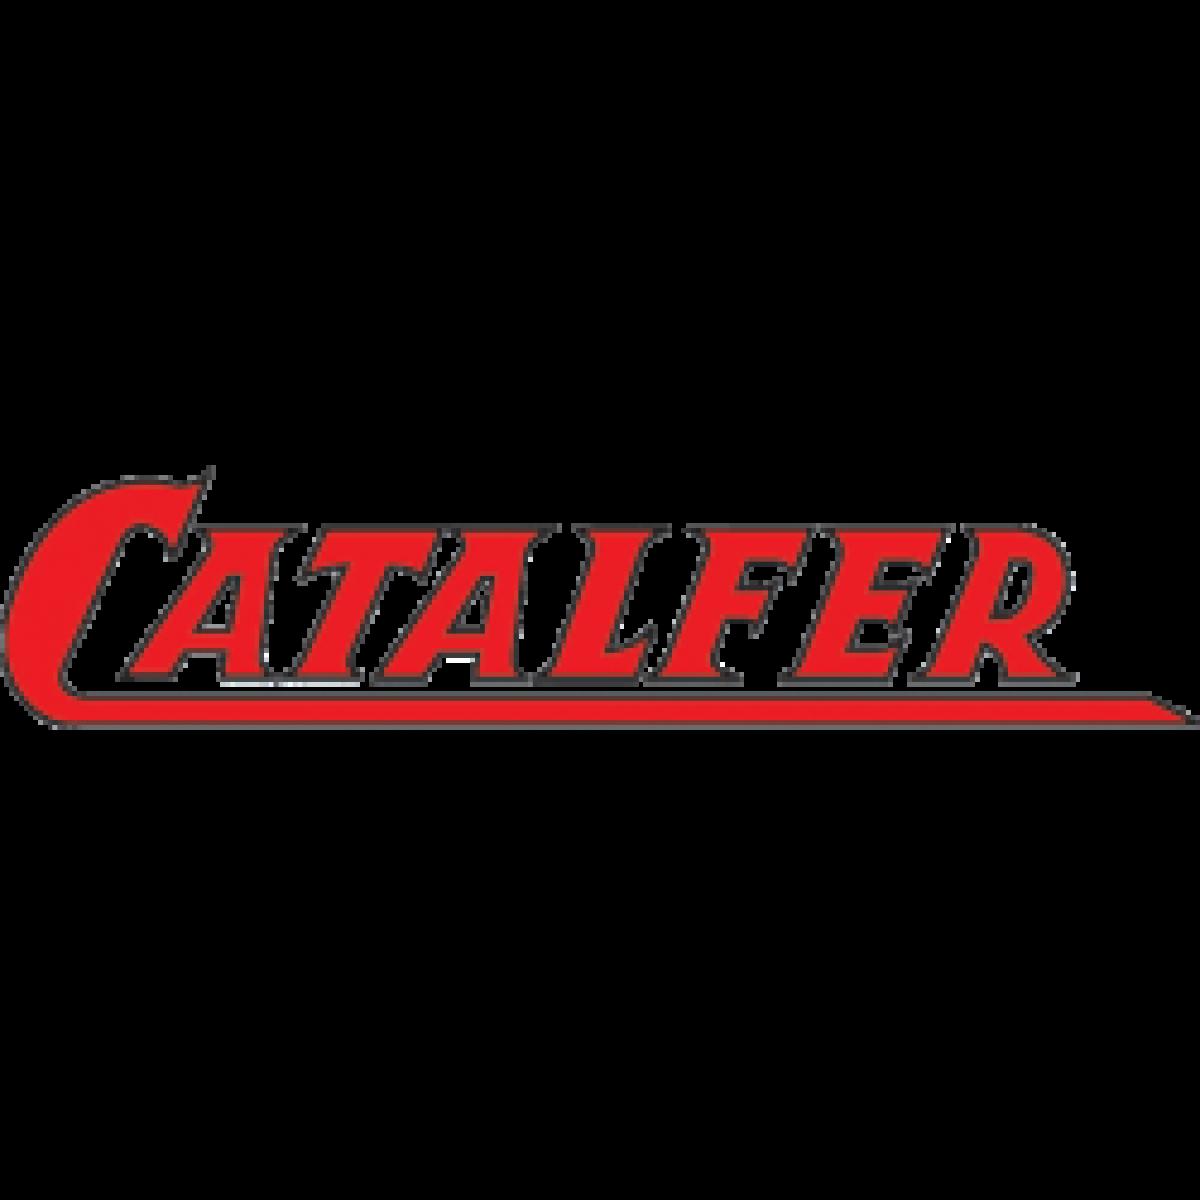 CATALFER